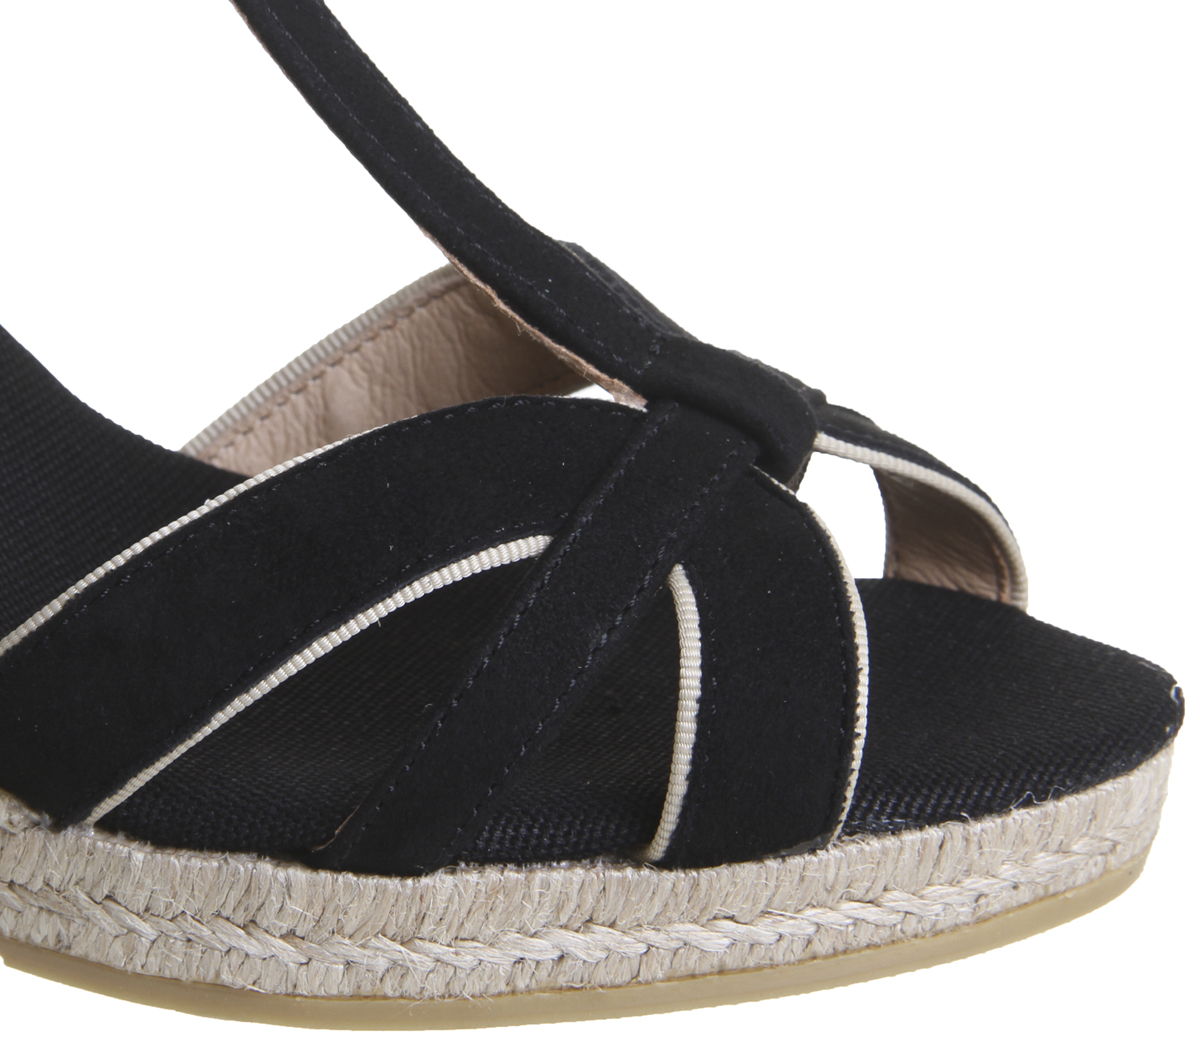 Damenschuhe Kanna Evita Sandale BLACK SUEDE Sandale